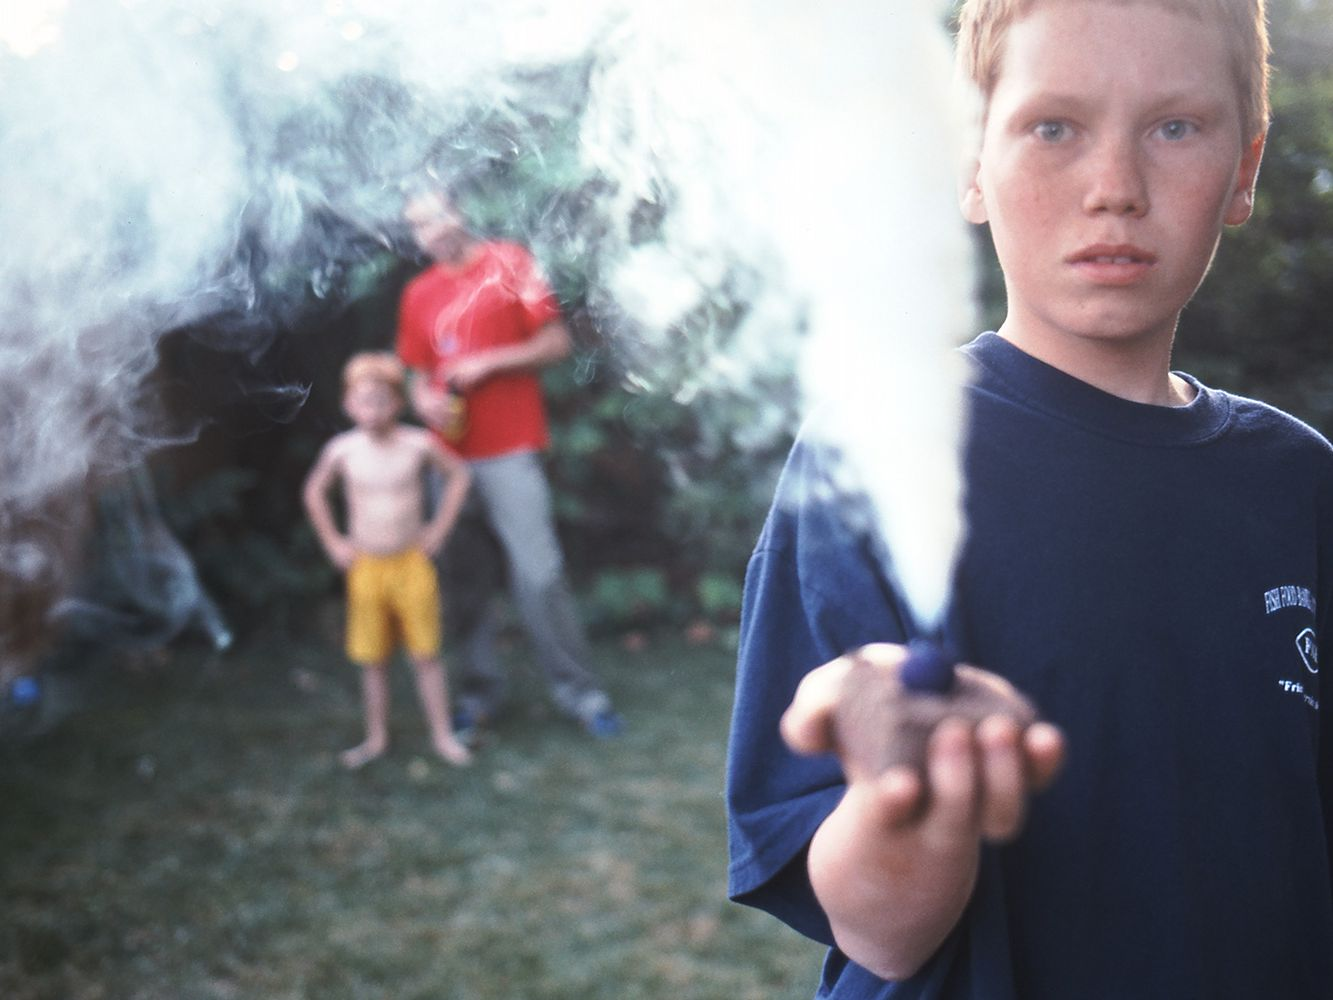 How to Make a Smoke Bomb